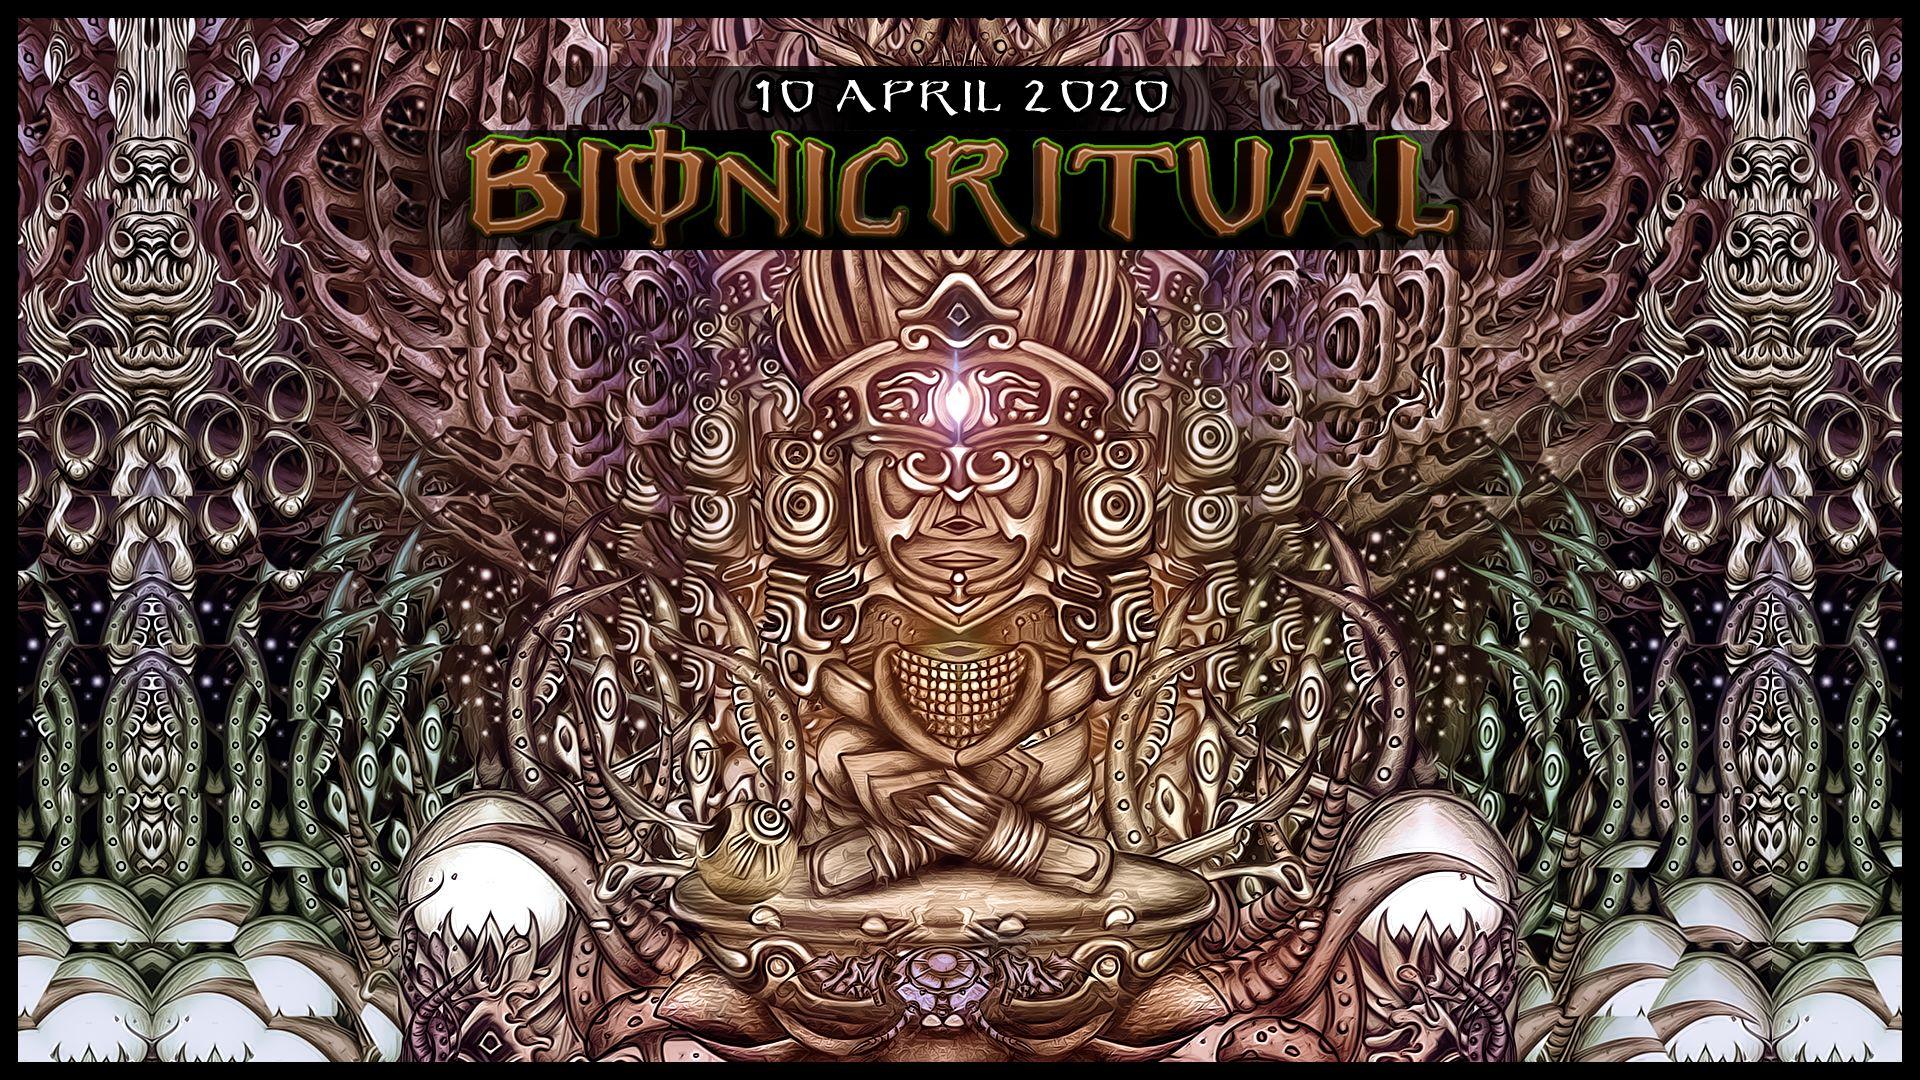 Bionic Ritual w/ Petran Live, Ianuaria Live, Muscaria Live am 10. April 2020 @ Arena 34.